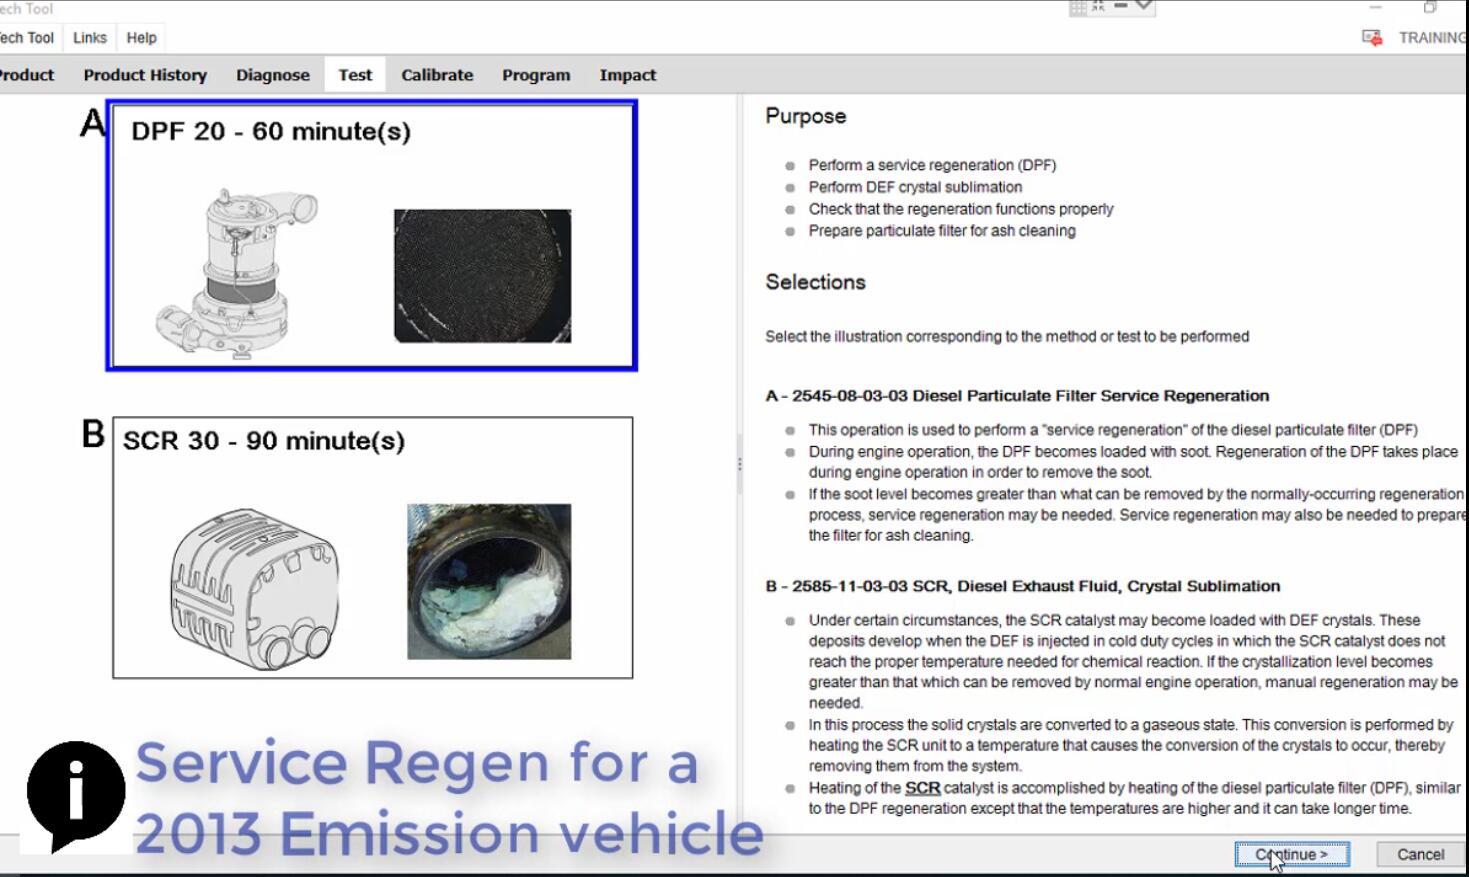 Volvo PTT Perform DPF Service Regeneration for 2017 Emission Vehicle (4)